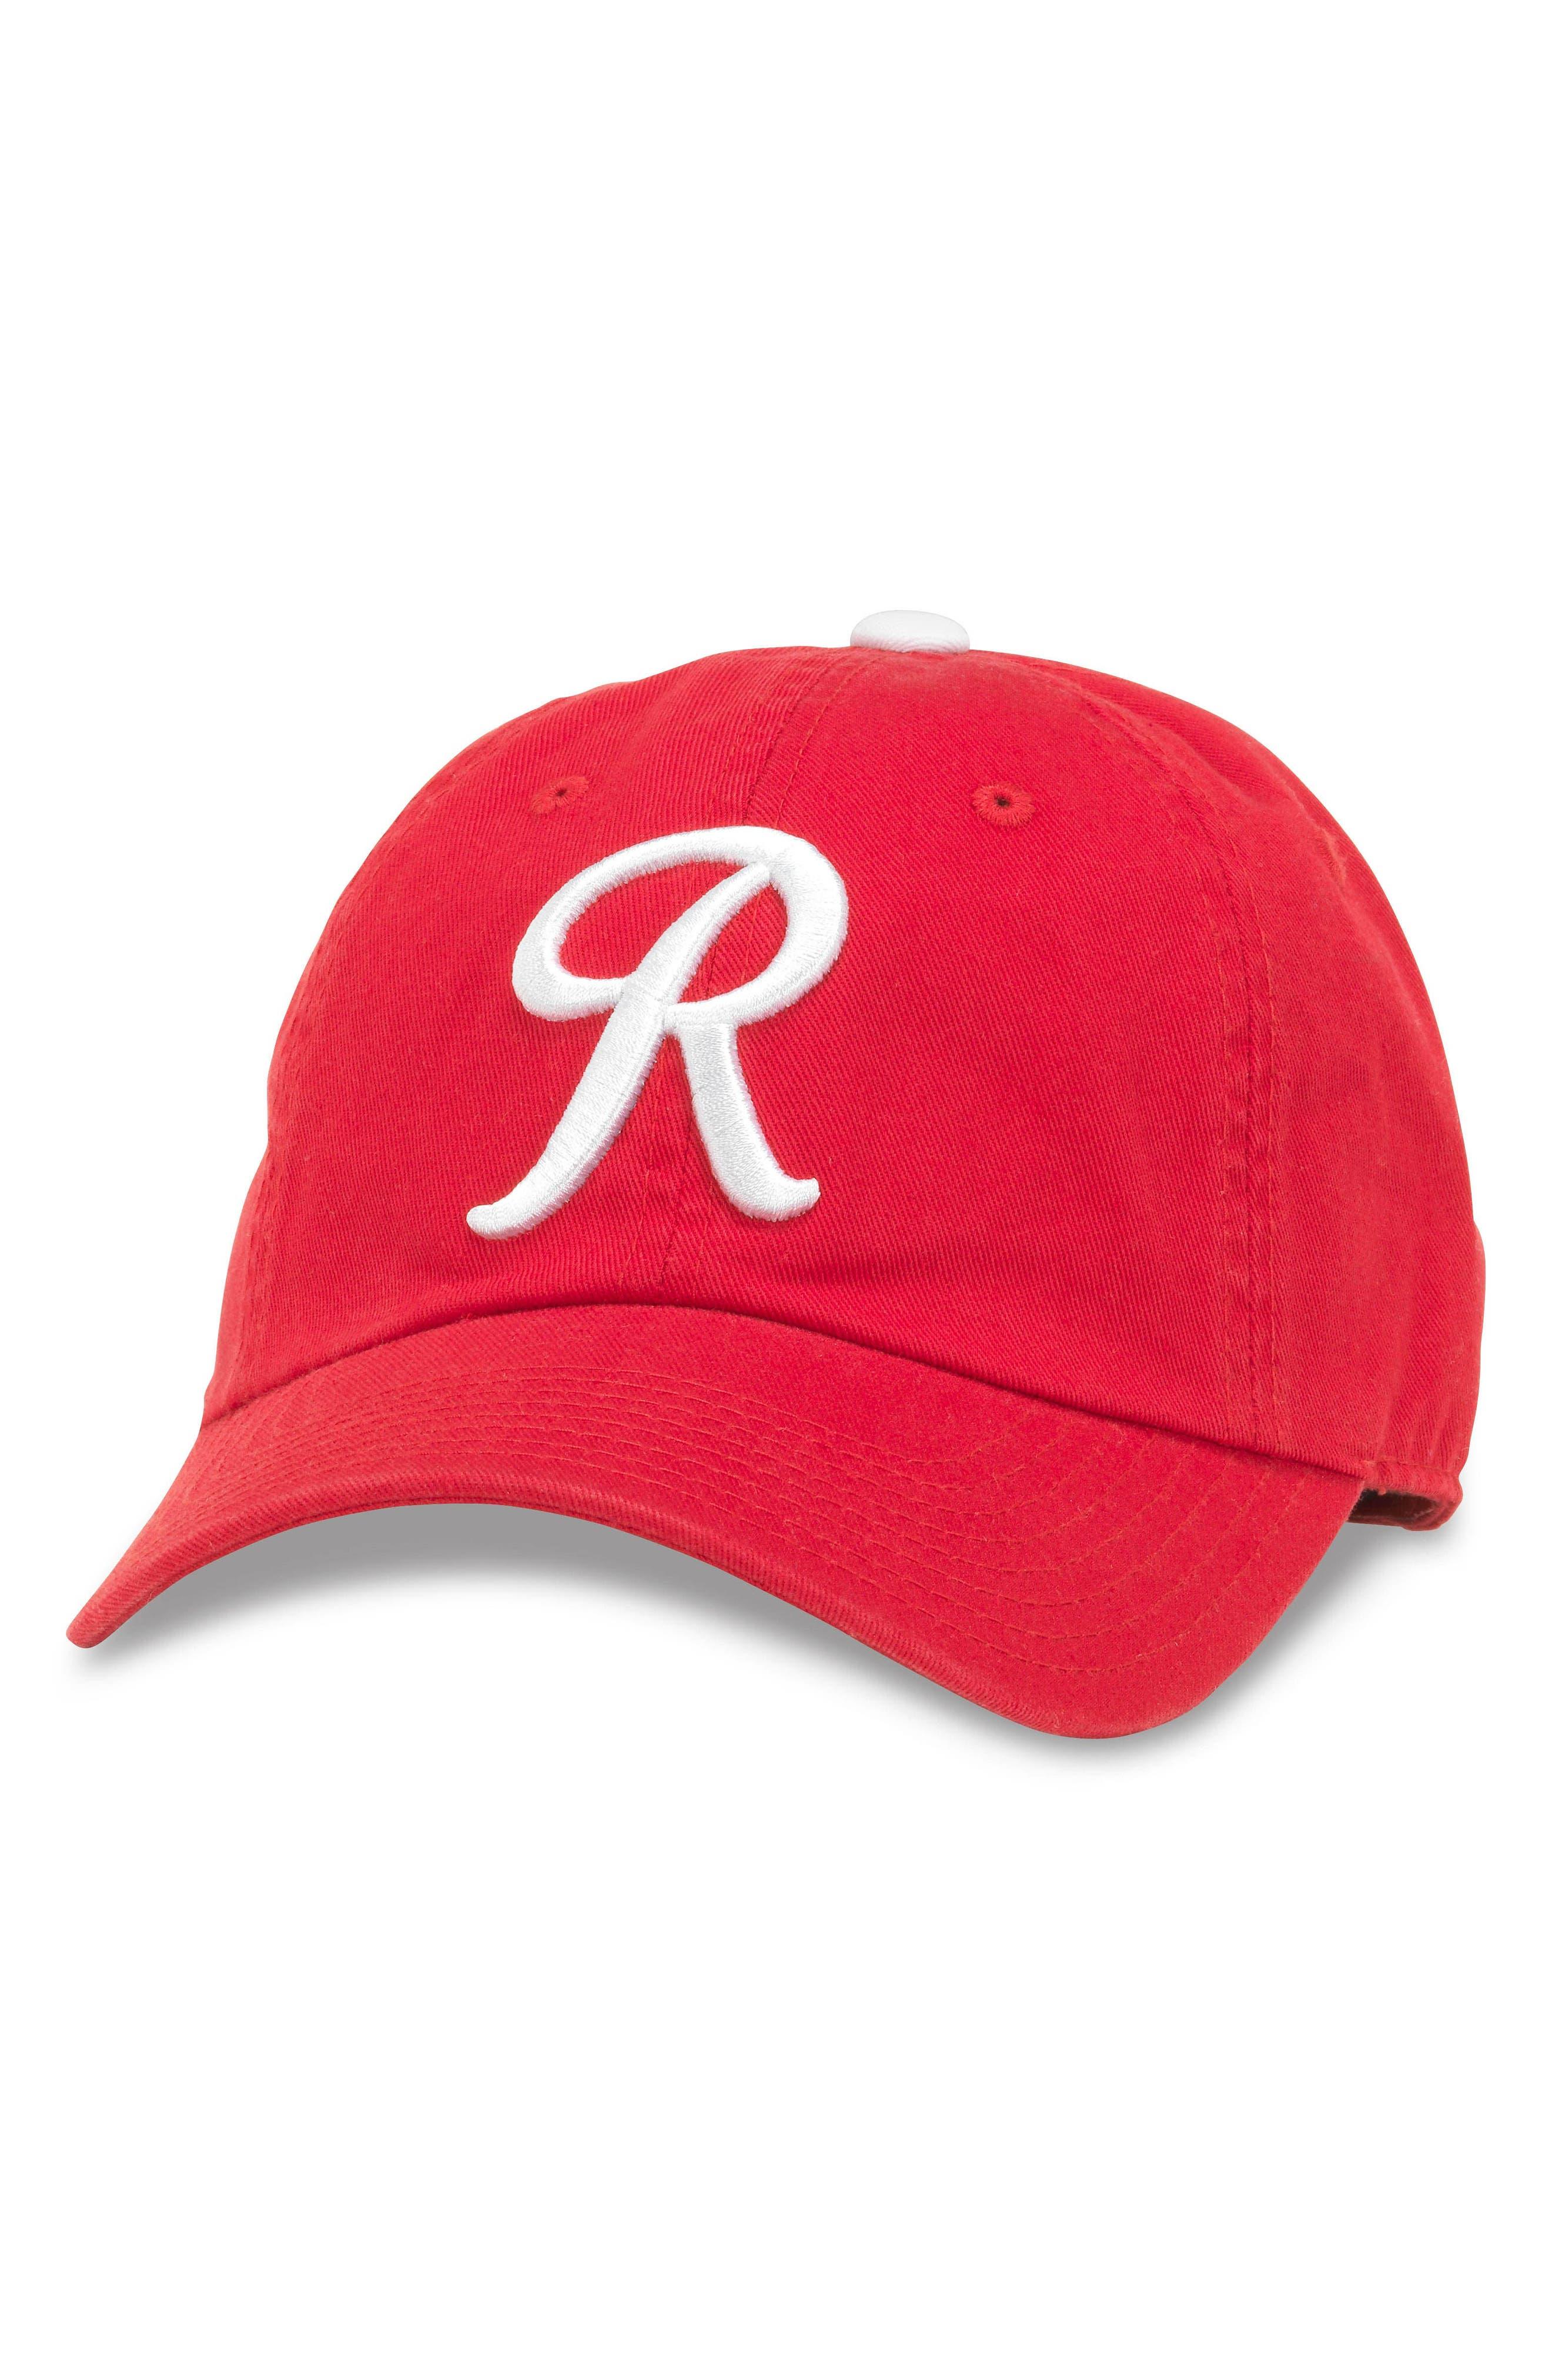 Ballpark MLB Baseball Cap,                         Main,                         color, Rainiers